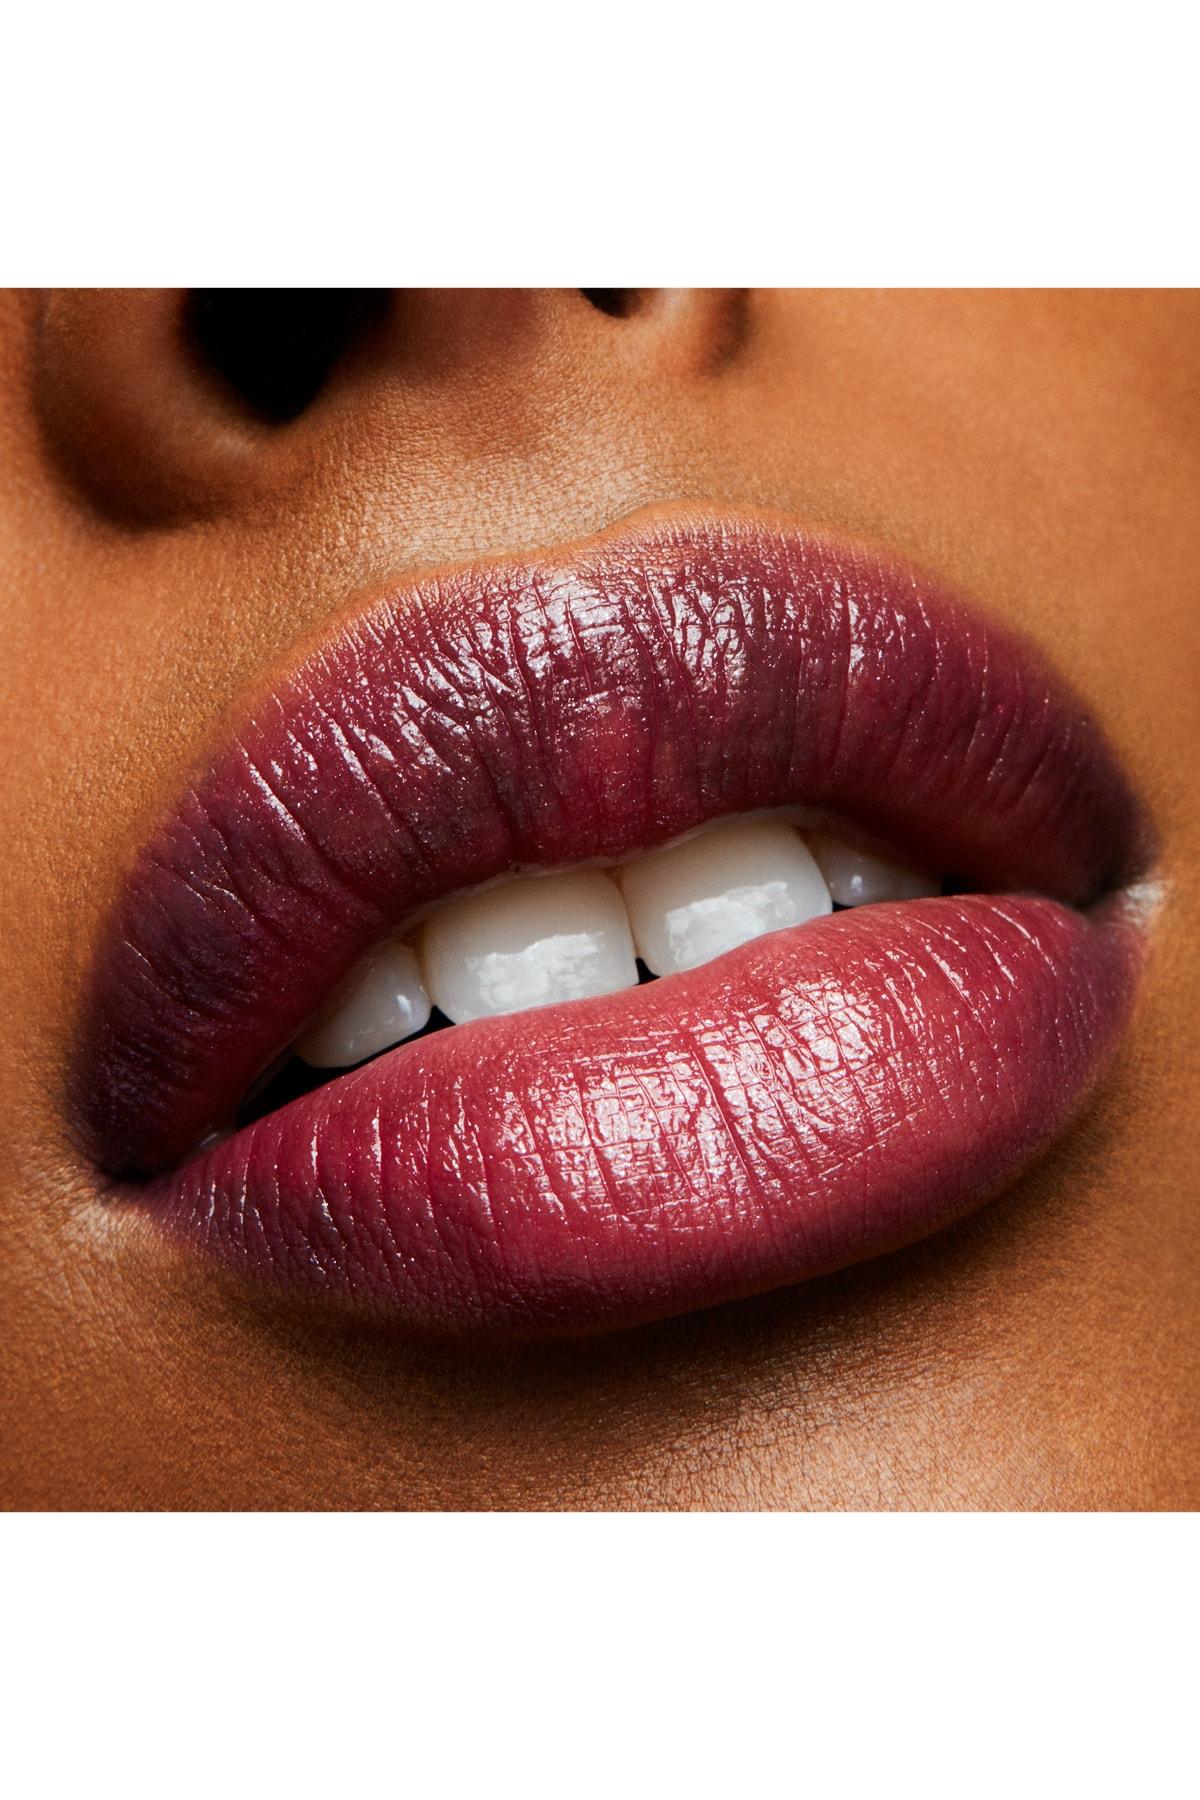 Mac Ruj - Lustre Lipstick Milan Mode 3 g 773602153626